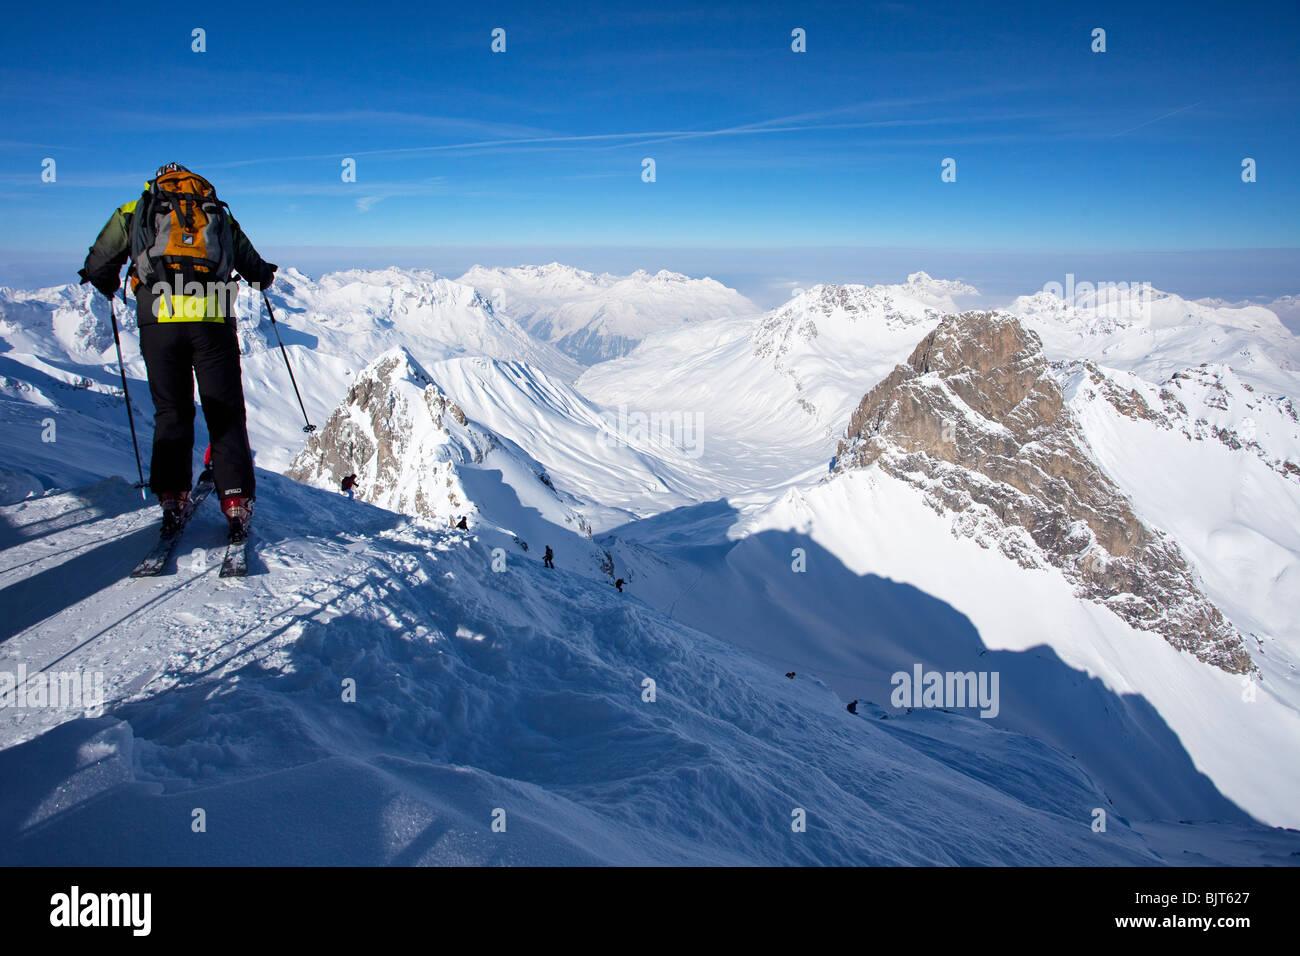 Skiing off-piste from summit of Valluga in St Saint Anton am Arlberg in winter snow Austrian Alps Austria Europe - Stock Image